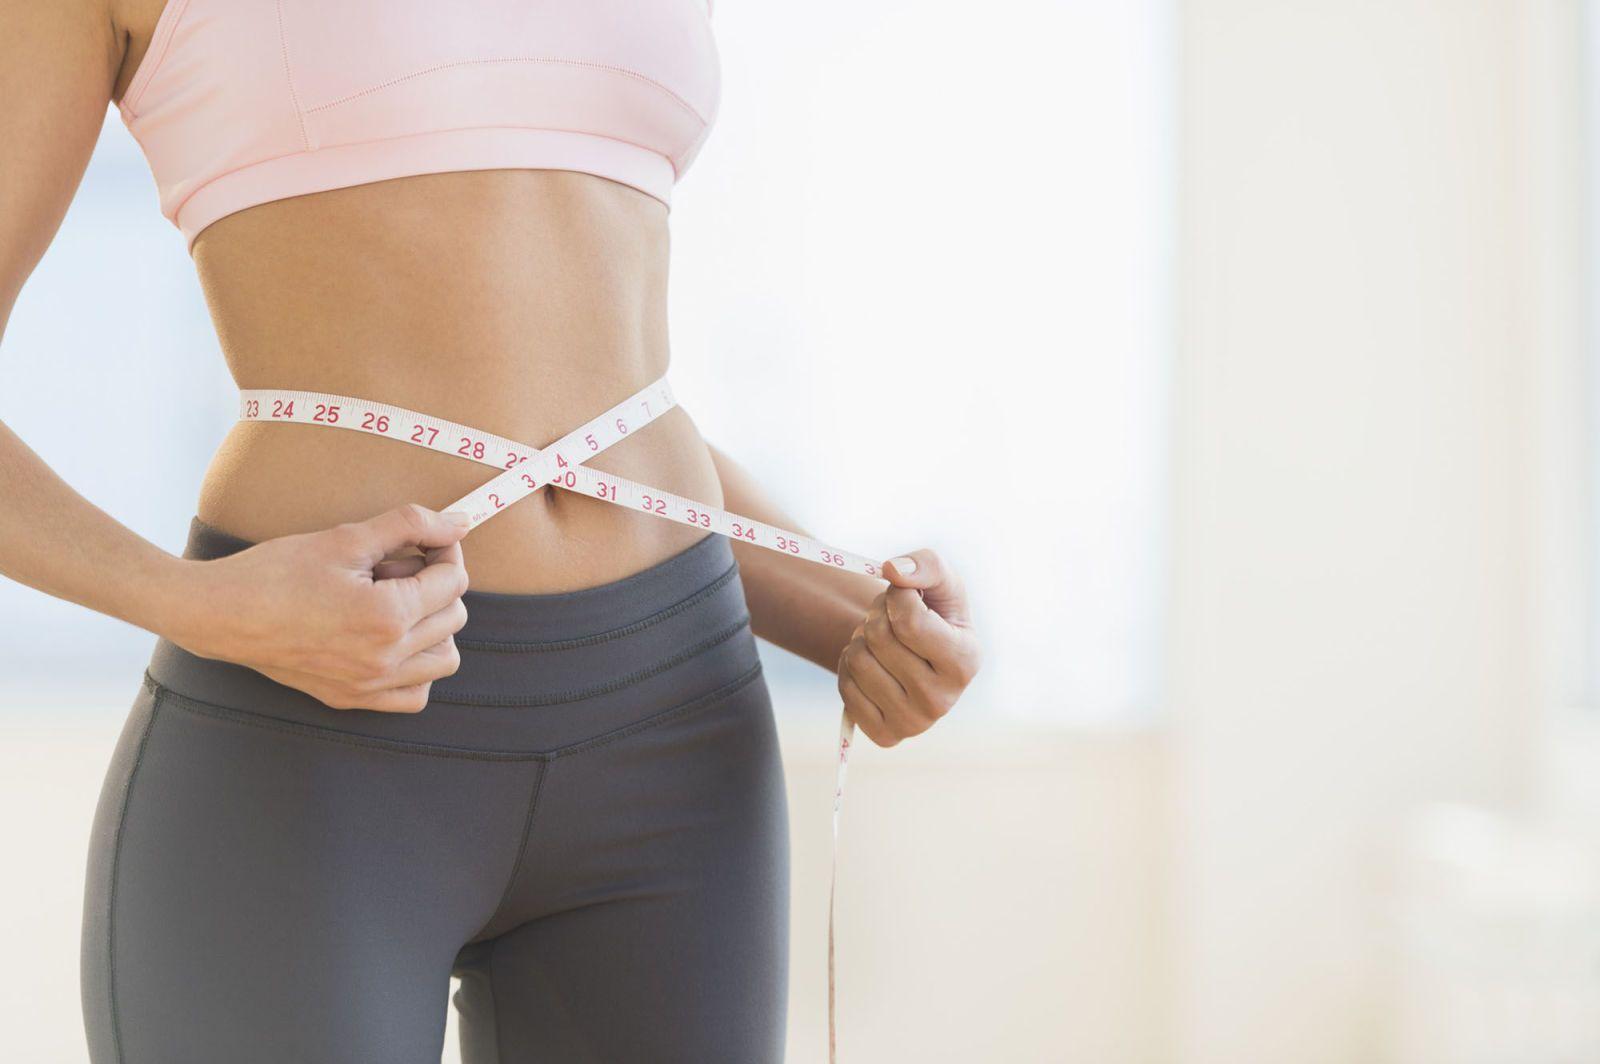 Diete Per Perdere Peso Gratis : Dieta per perdere peso gratis dieta per perdere peso gratis la